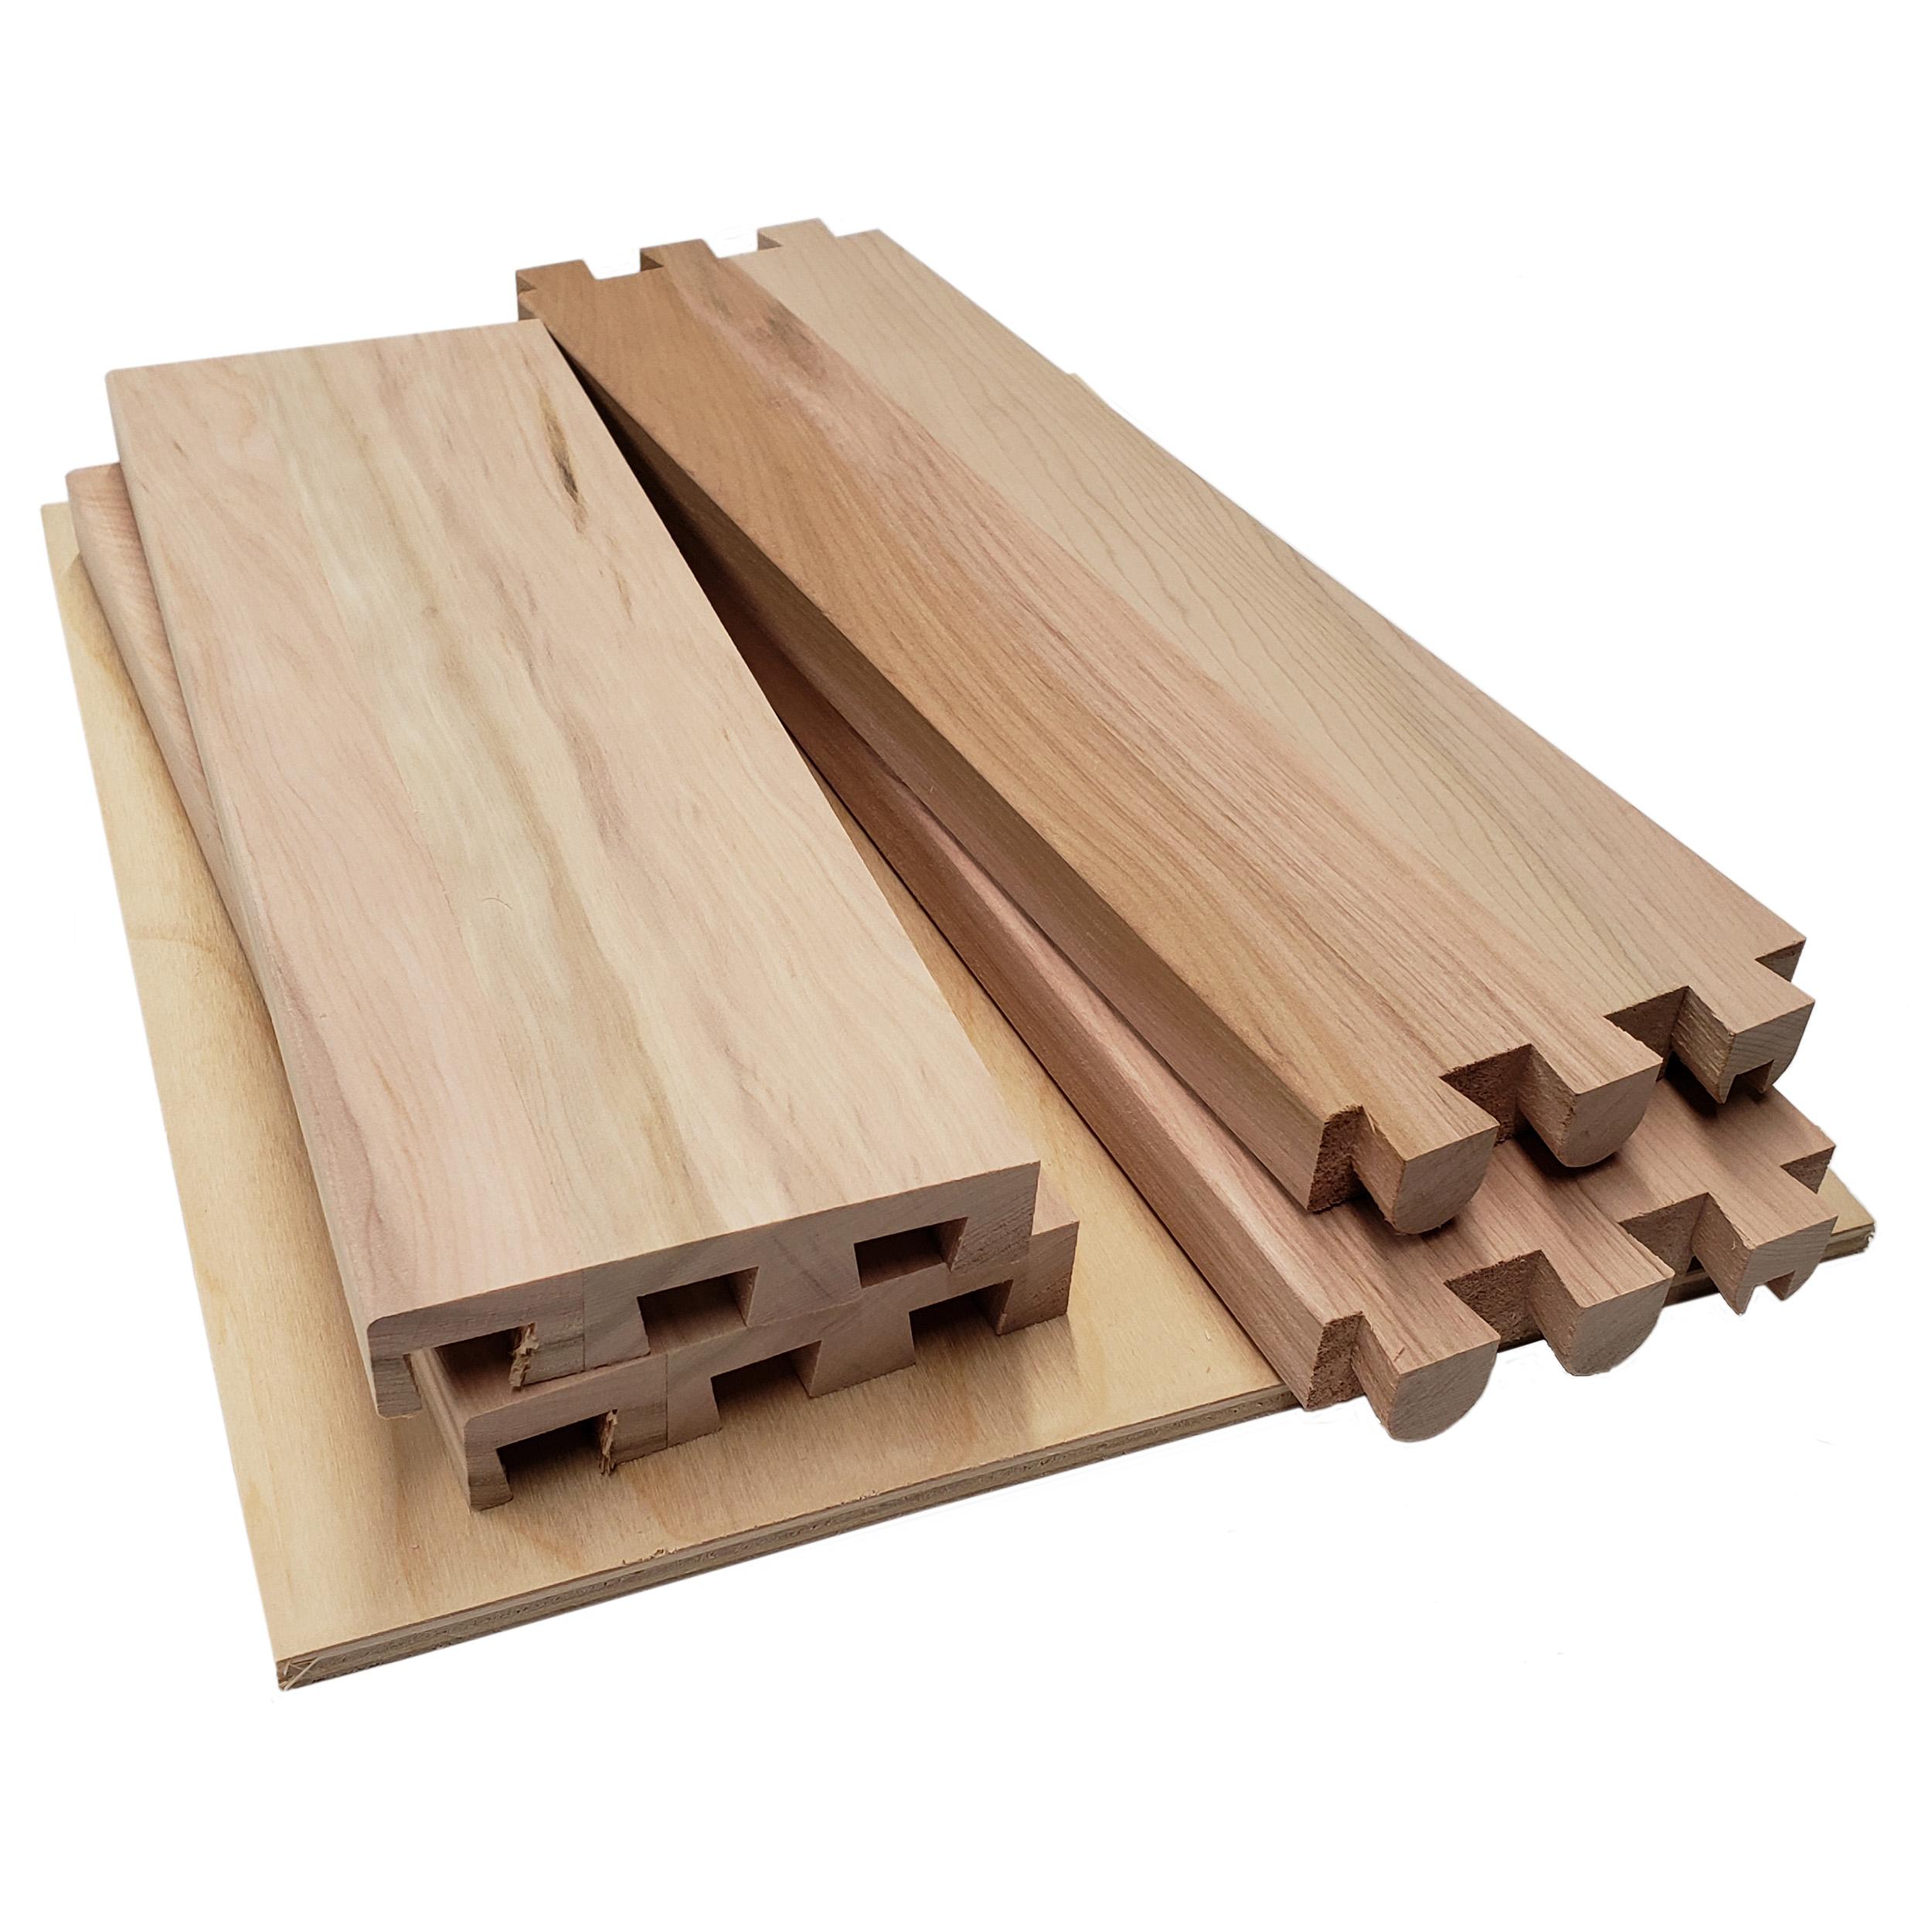 Dovetail Drawer Boxes - 3.125